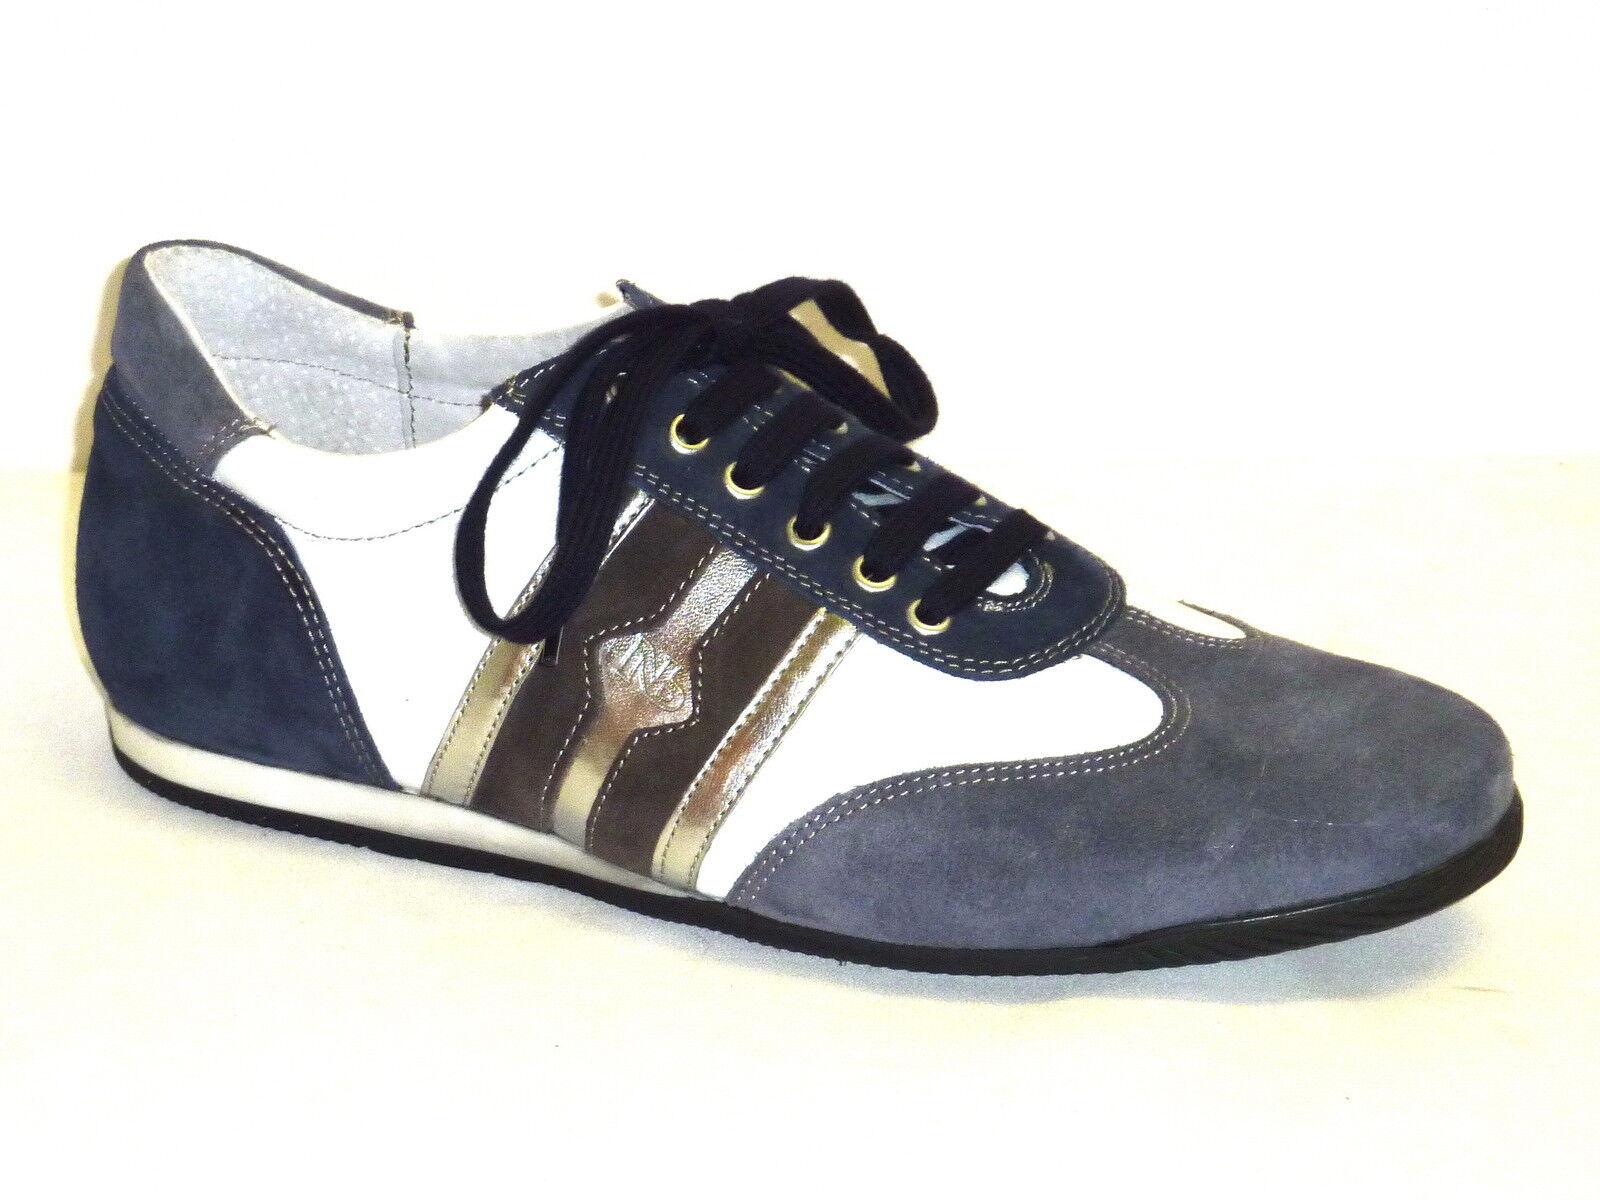 Chaussures hommes CASUAL TENNIS SPORTIVE ALLACCIATE IN PELLE BIANCO bleu n. 43